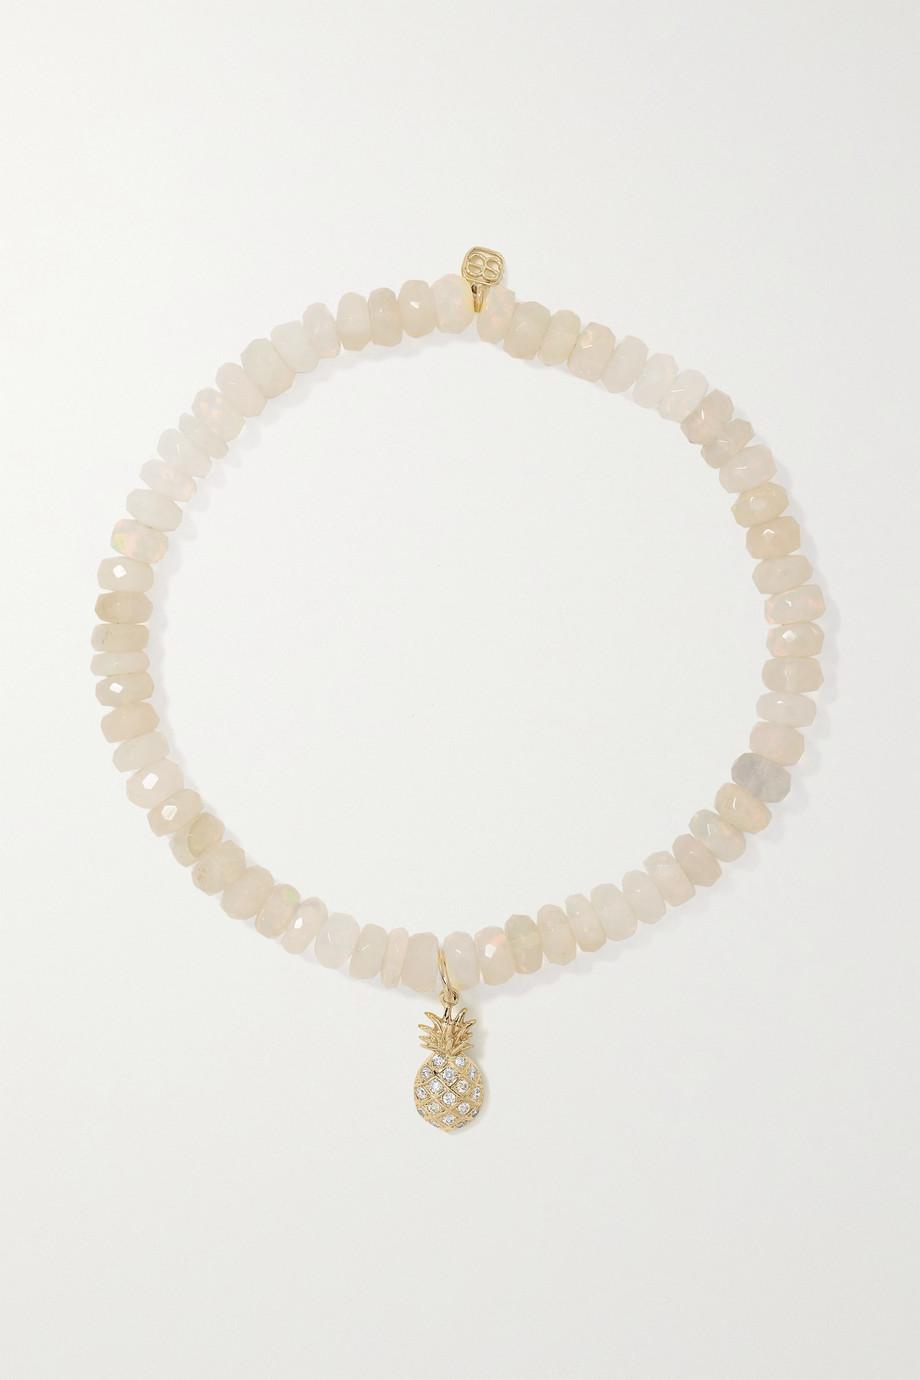 Sydney Evan Bracelet en or 14 carats (585/1000), opales Welo et diamants Pineapple